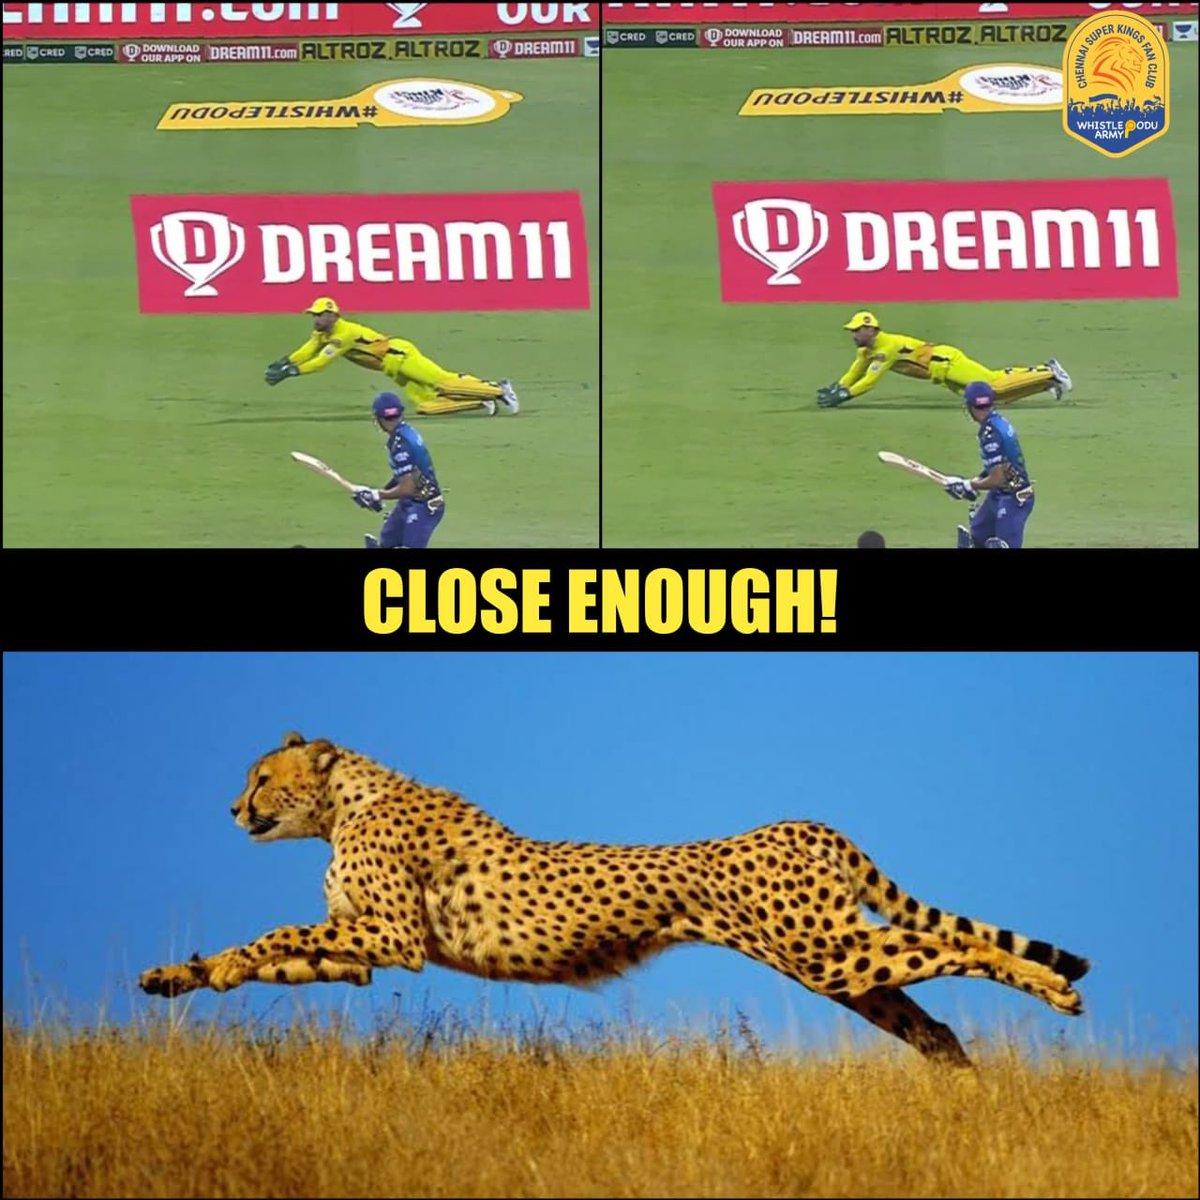 Fast. Faster. Fastest behind the stumps!   #WhistlePodu #Dhoni #CSK https://t.co/PmKlPRzU1j